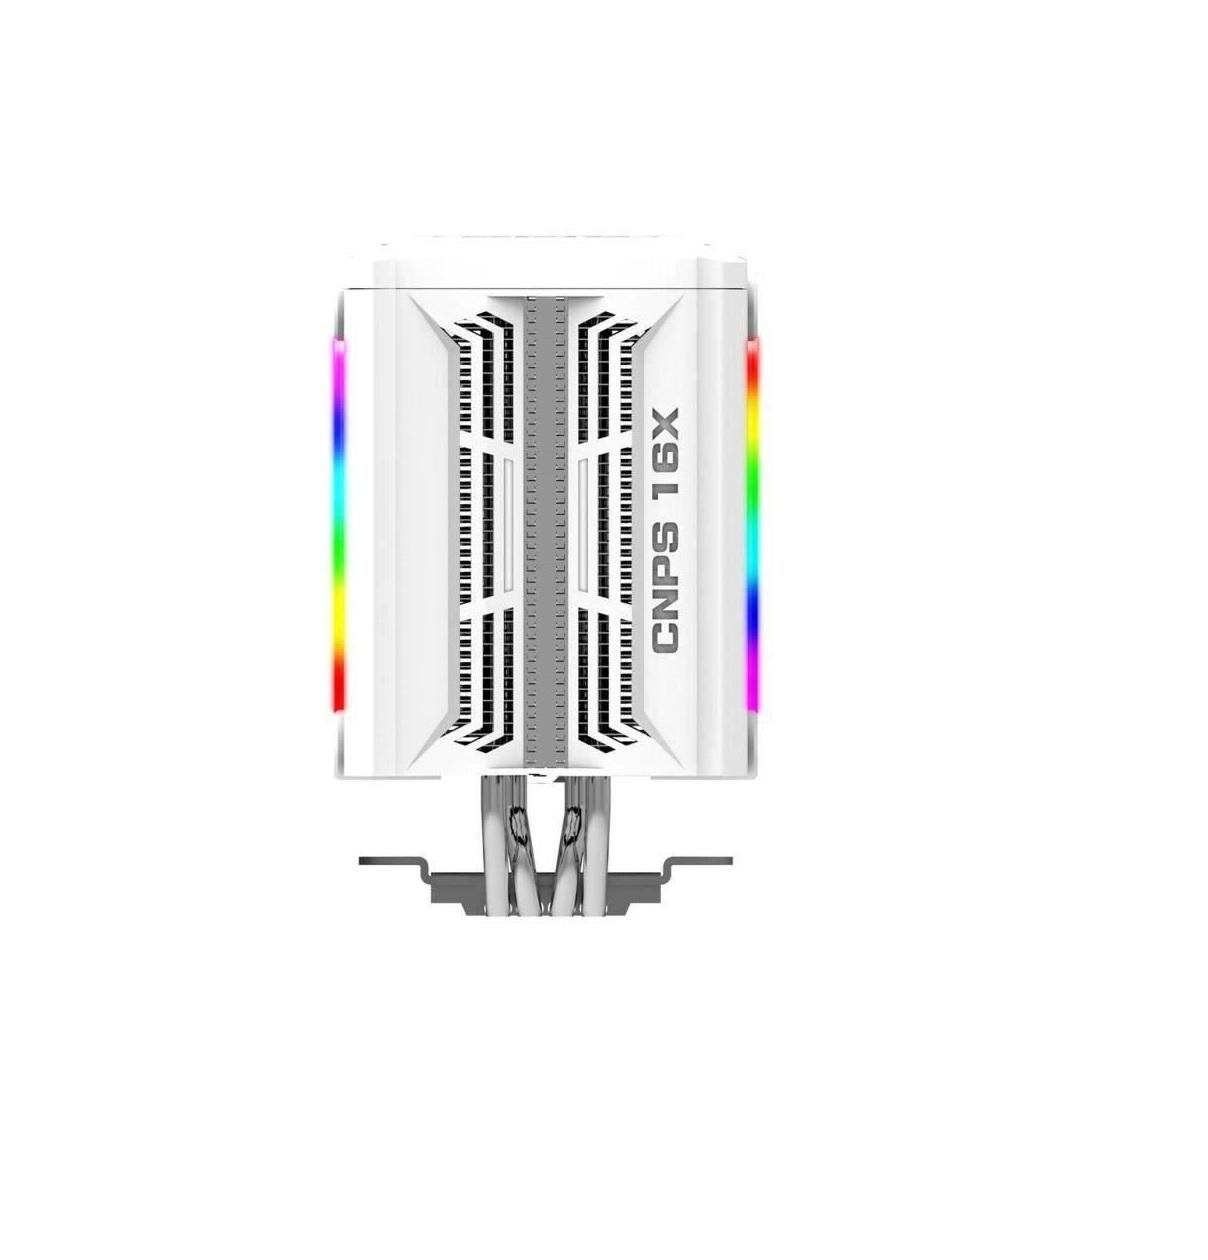 Xtreem - 2 x 8 Go - DDR4 4500 MHz - Noir